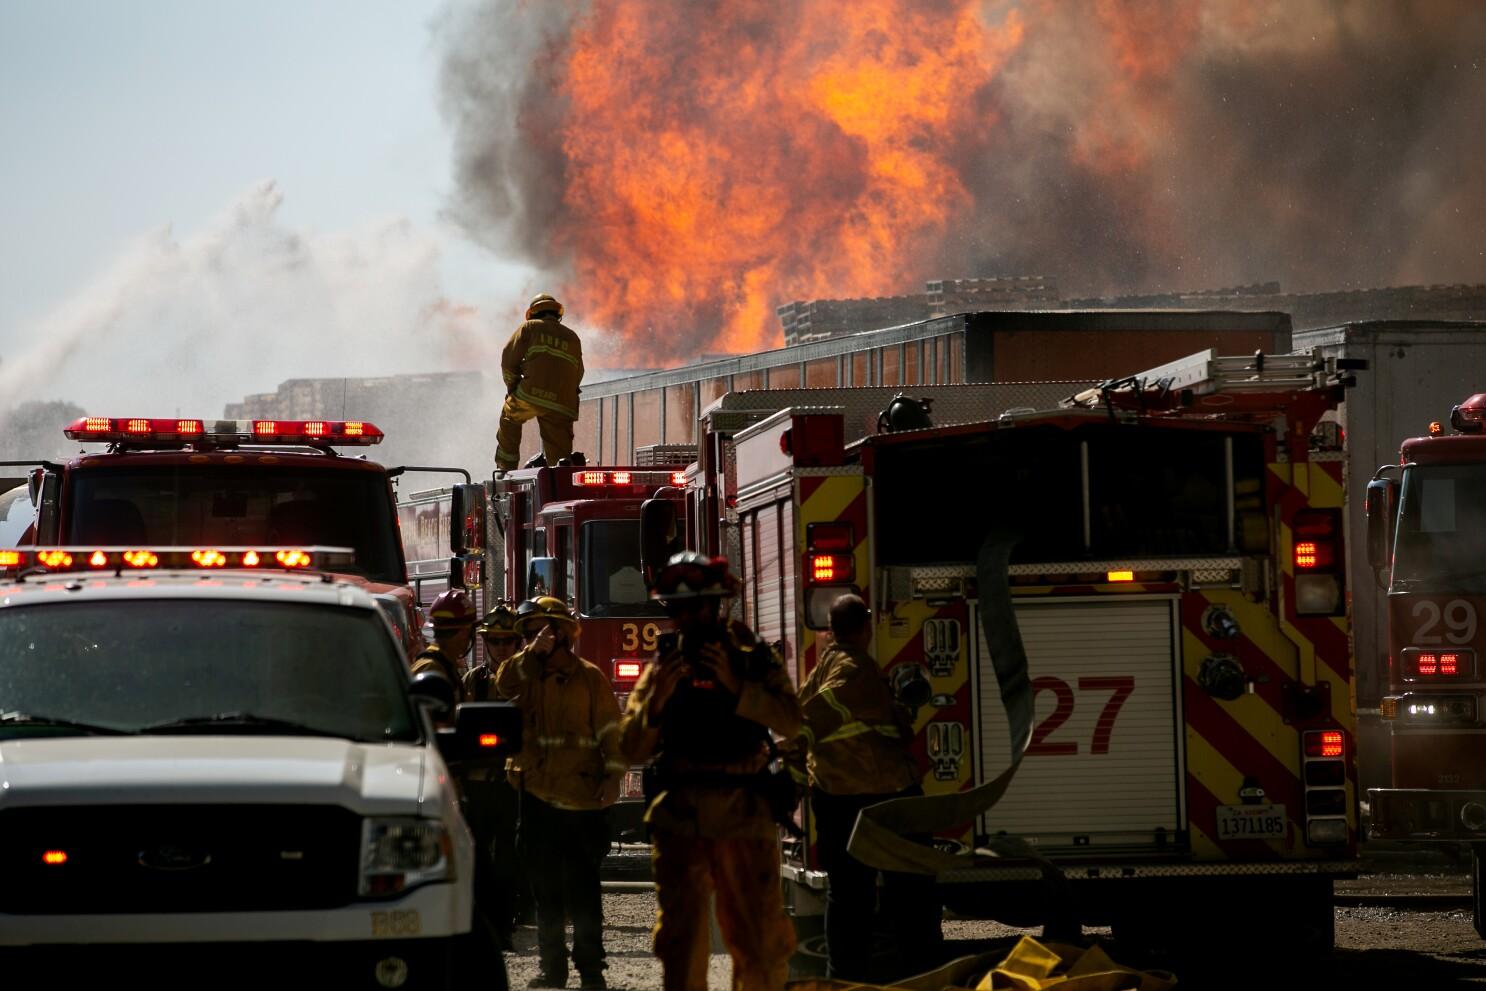 Otay Mesa brush fire burns 490 acres near border